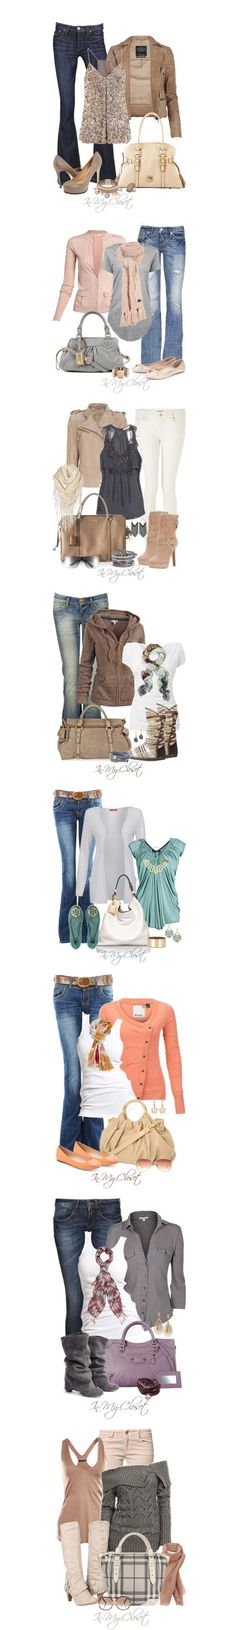 20-Unique-Spring-Fashion-Trends-Ideas-For-Girls-Women-2013-20.jpg 550×3,800 pixels